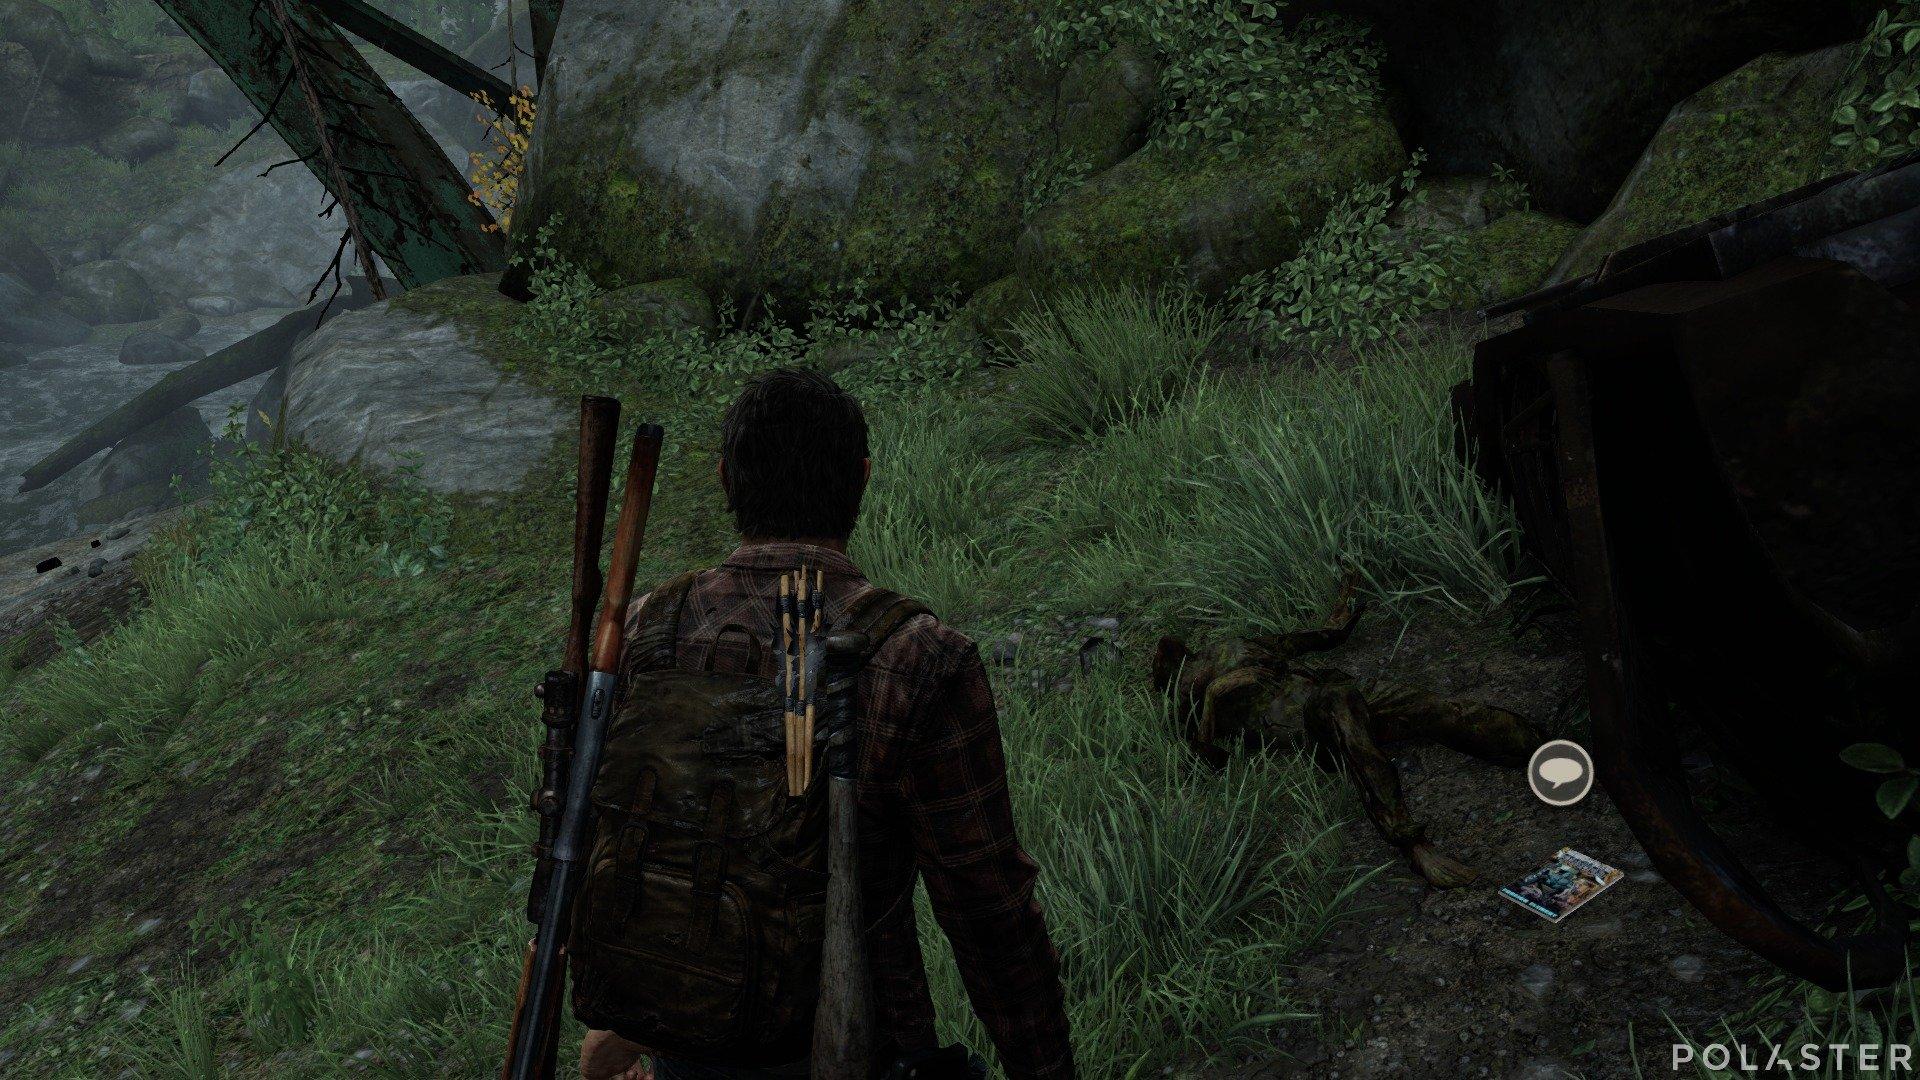 The Last of Us Cómic (Elemento extraño)